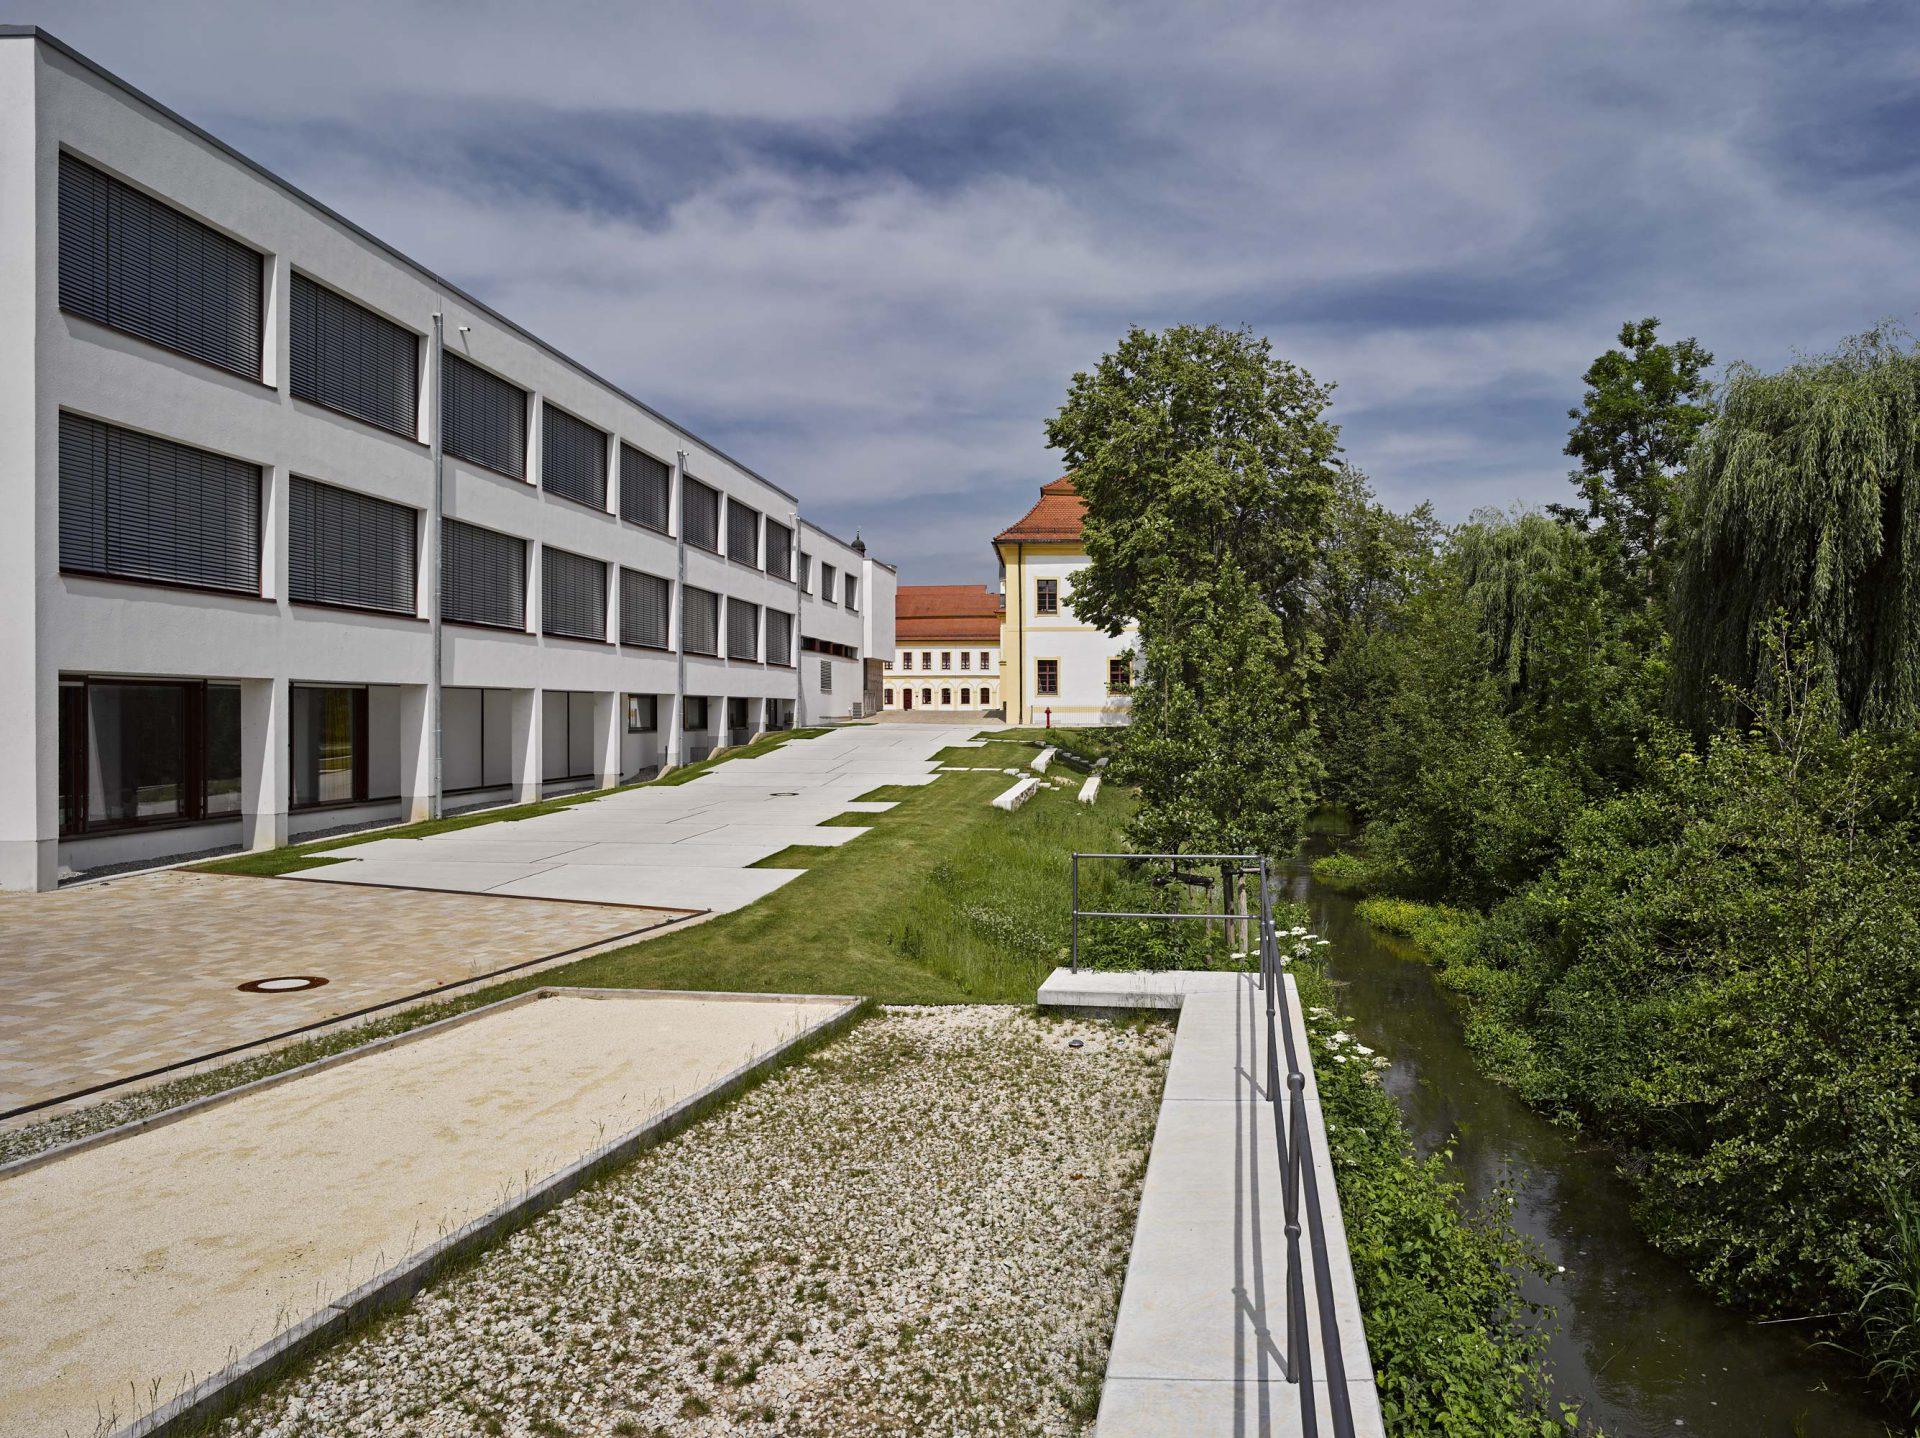 LAW-Rebdorf-180529-0045-01